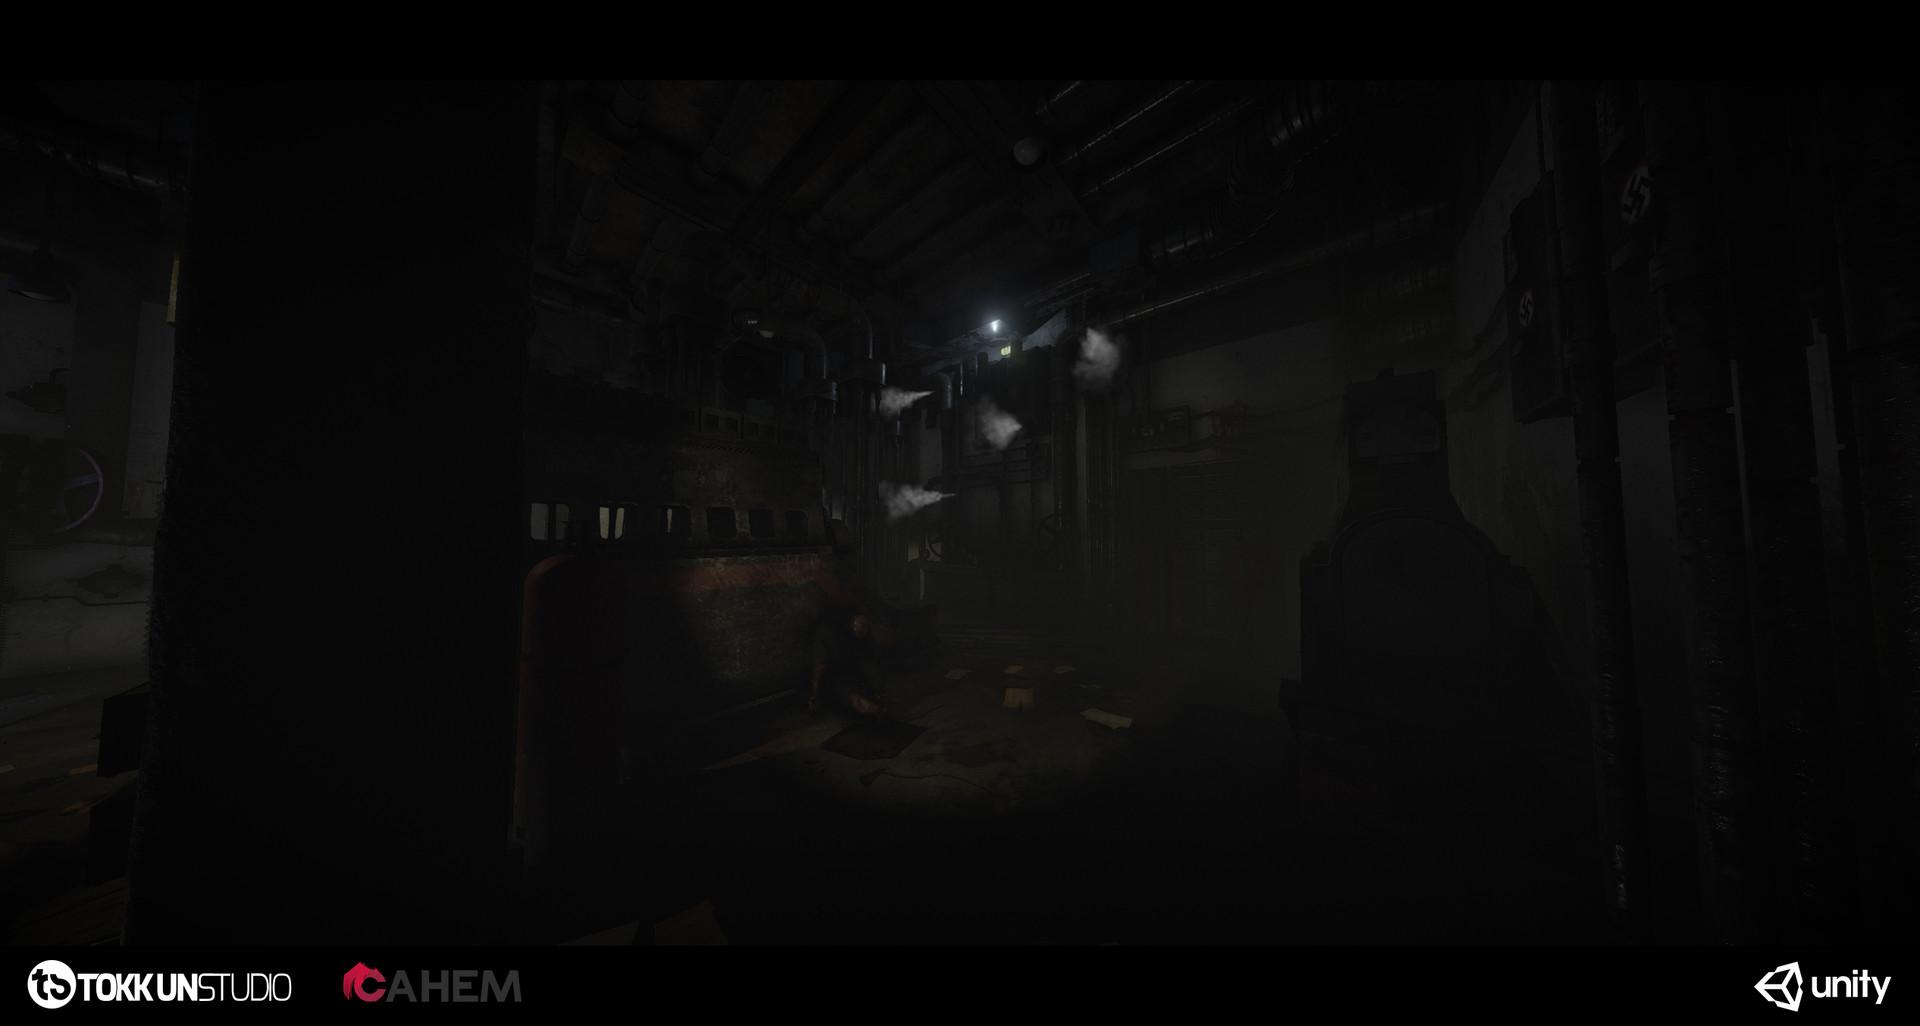 Tokkun studio bunker shot 19